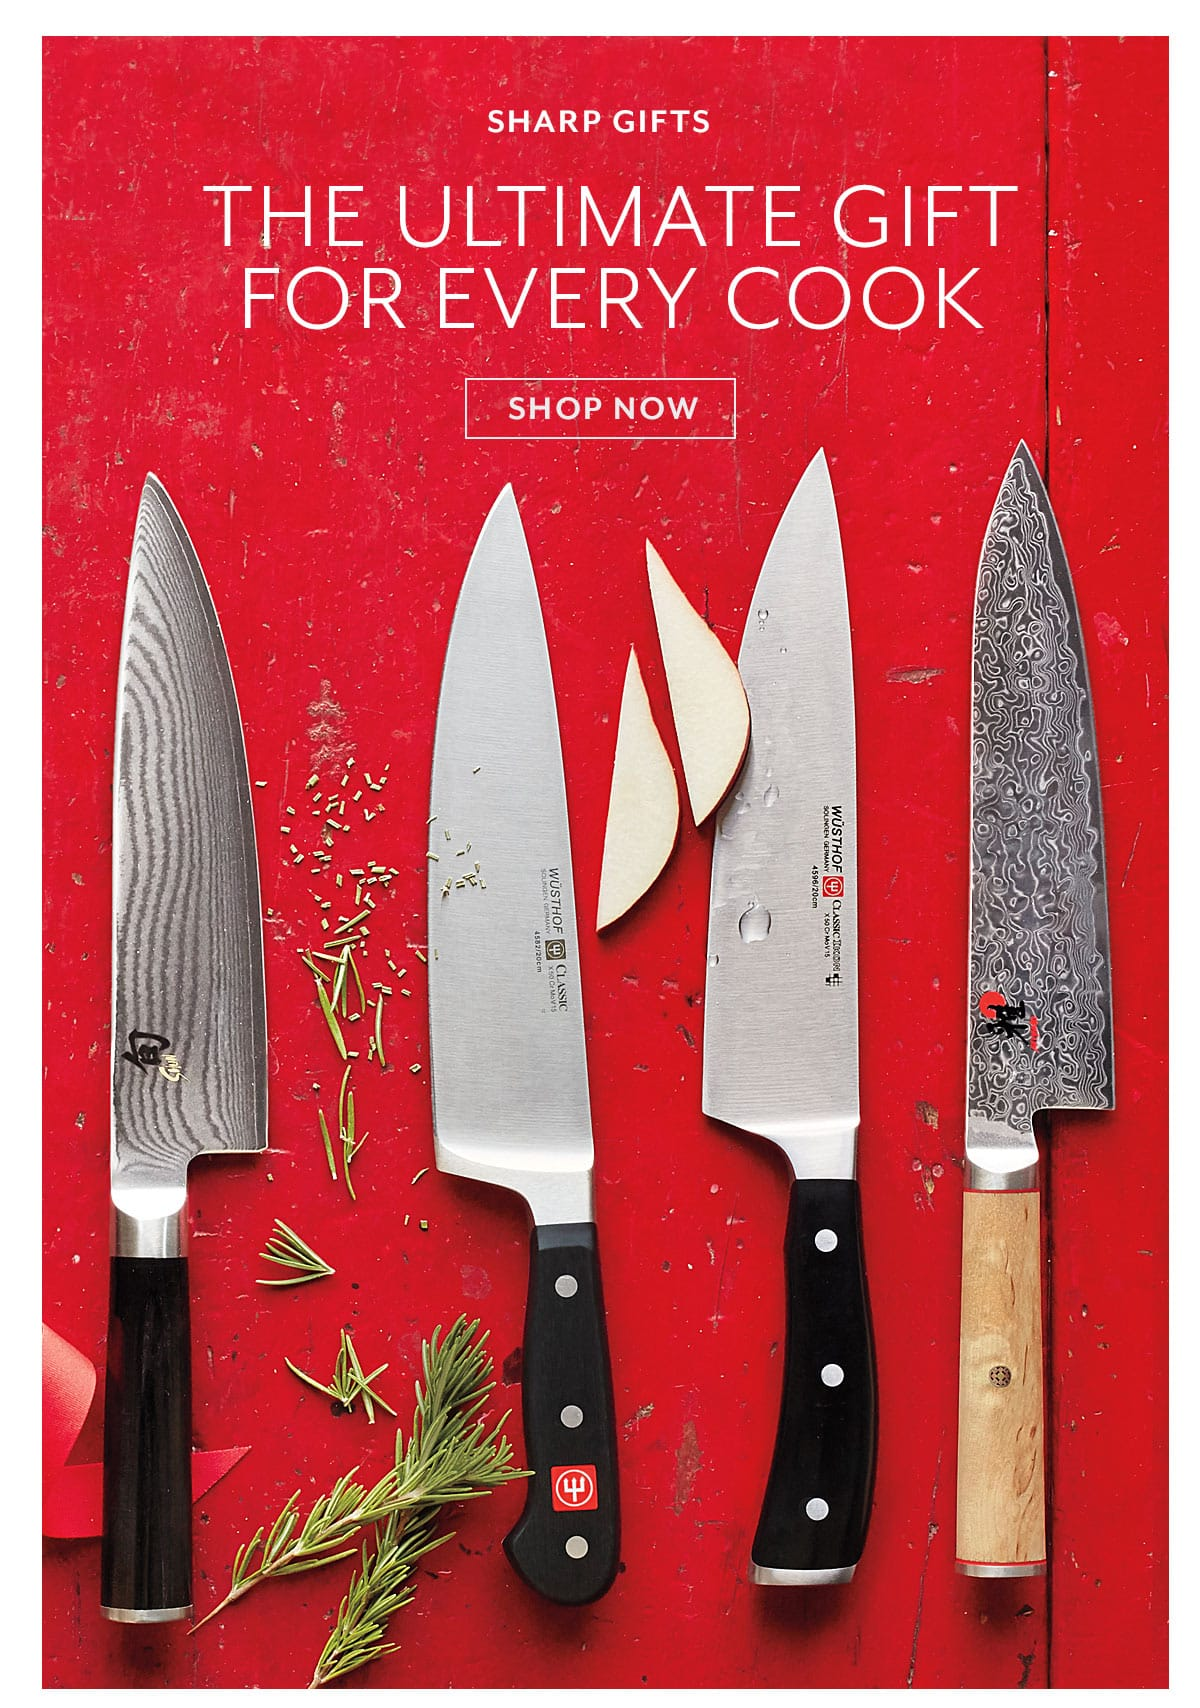 Sharp Gifts - Knife Sale Shop